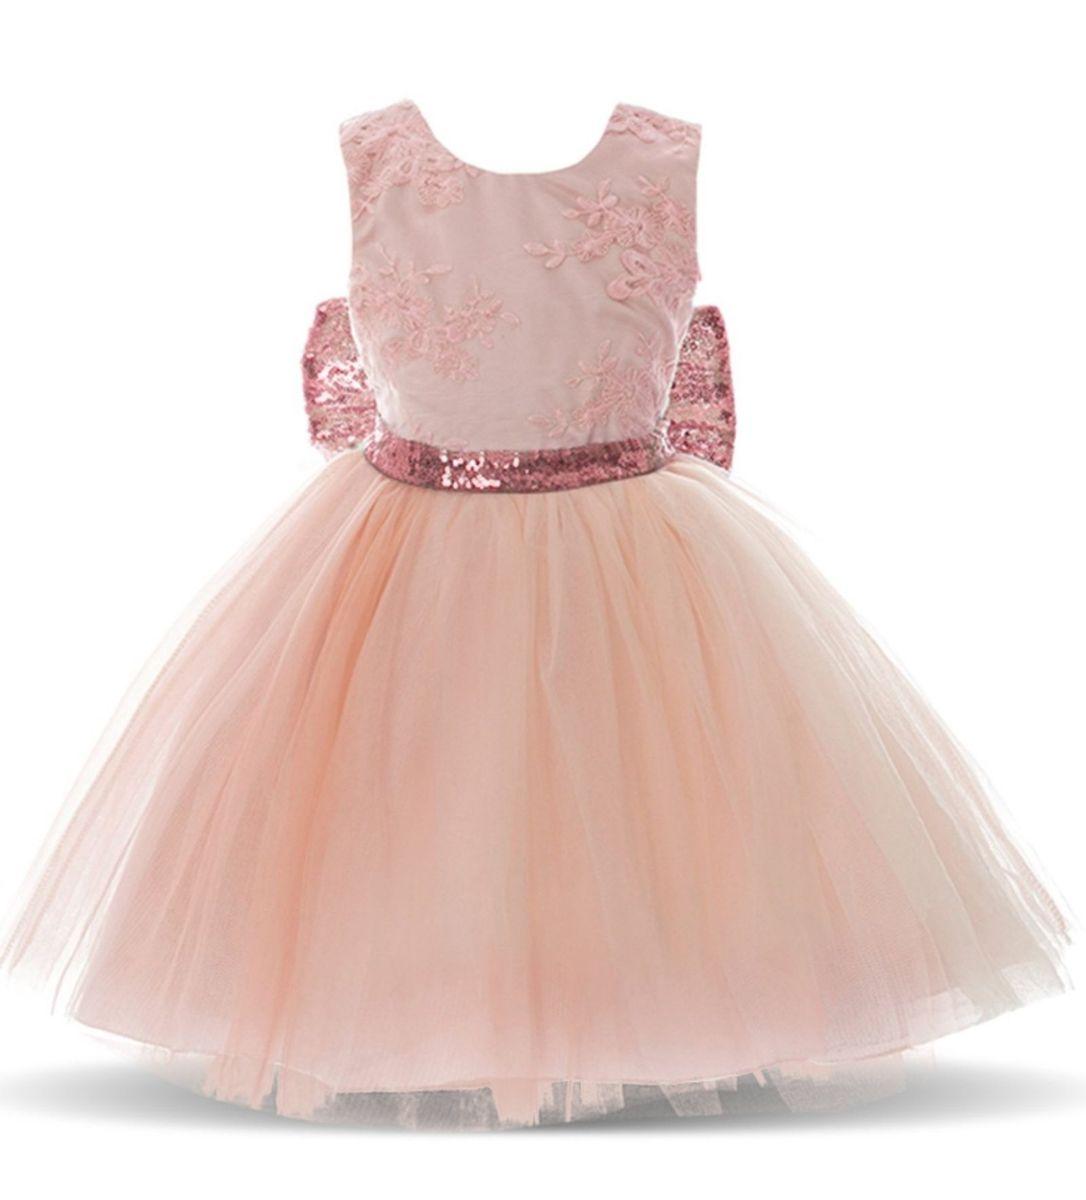 6755bd0bfa vestido de festa importado - menina sem-marca.  Czm6ly9wag90b3muzw5qb2vplmnvbs5ici9wcm9kdwn0cy80njqwodi2l2ewmdy2nmvmmjq1mze1nwq4yje1yzgwywrmmdkynjc1lmpwzw  ...